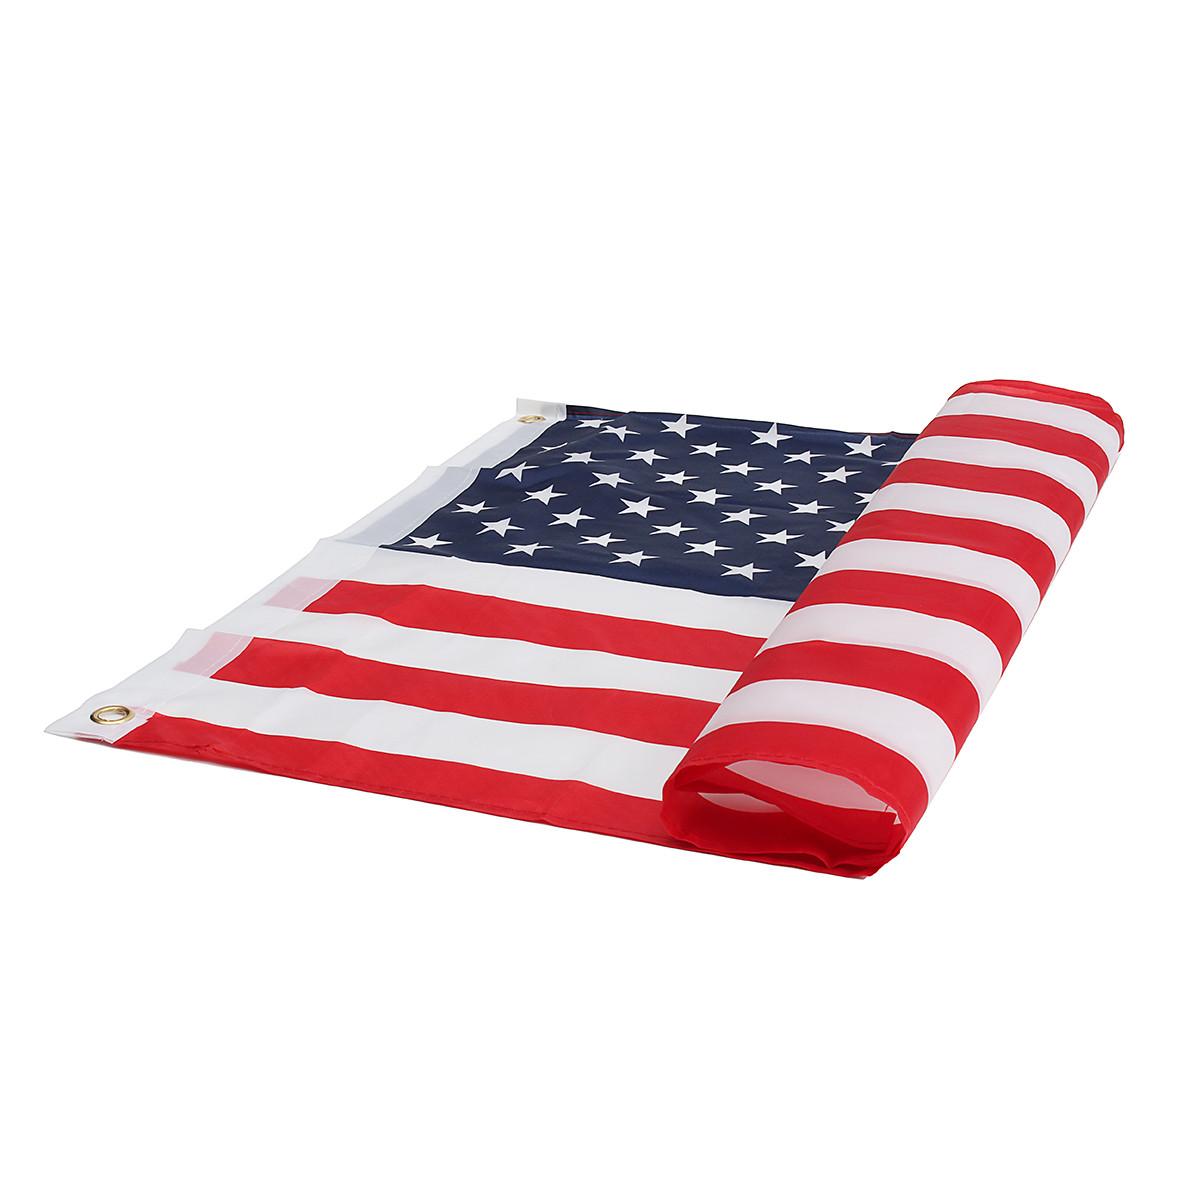 2 дюйма х 3 дюйма FT США США США США Американский флаг Полиэстер Звезды Латунная втулка мотоцикл - 1TopShop